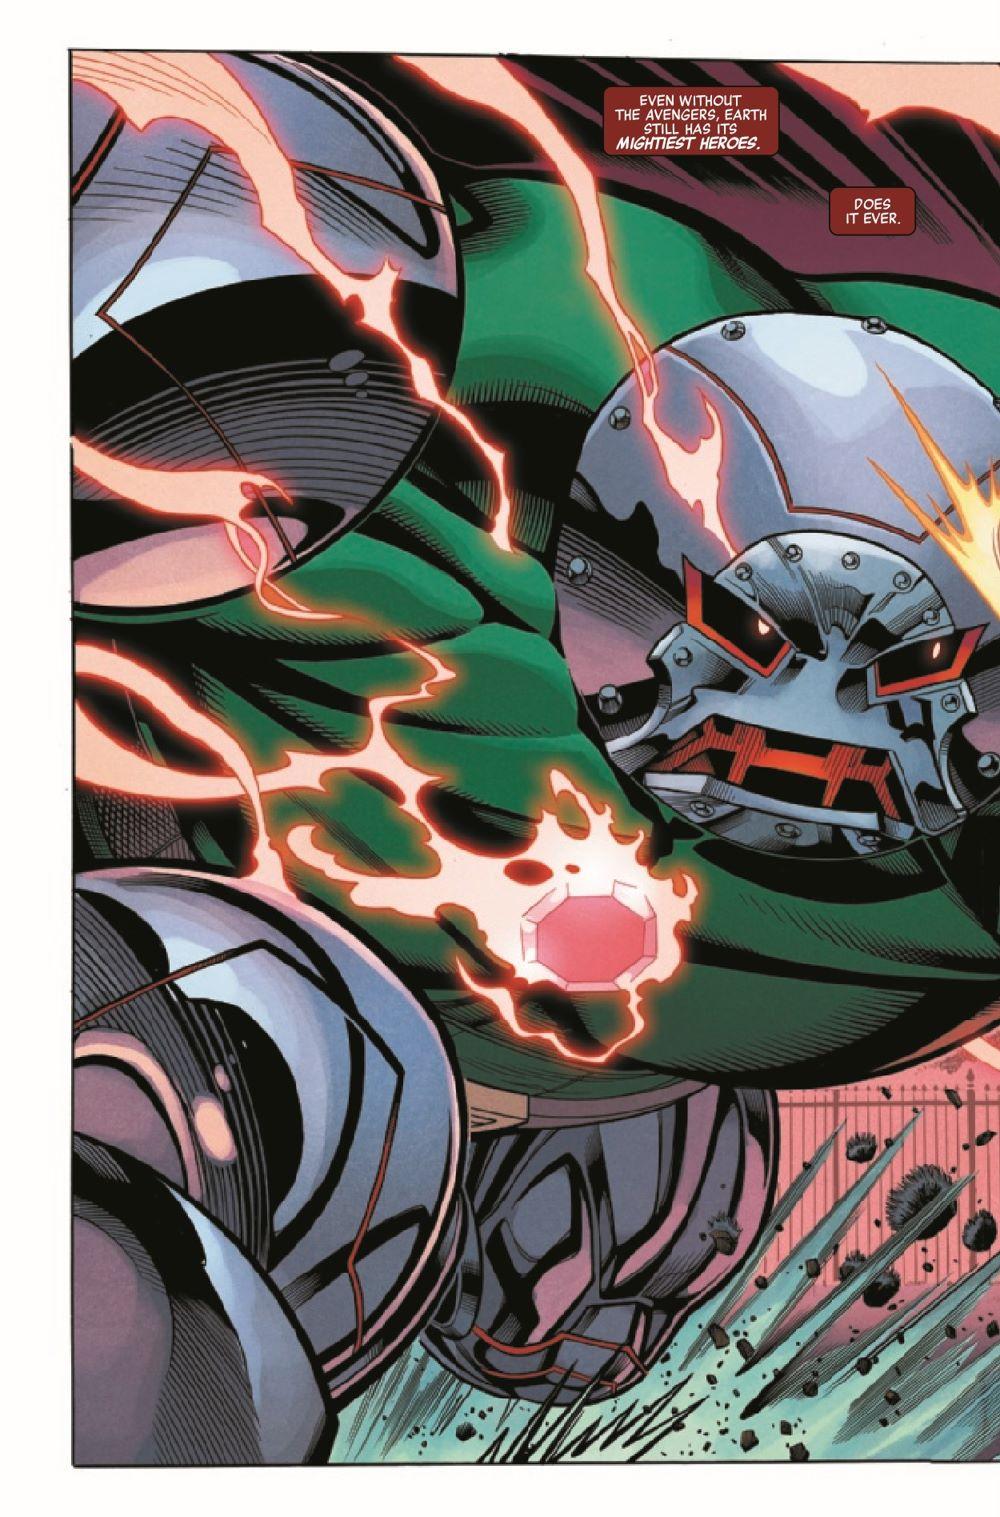 HEROESREBORN2021001_Preview-6 ComicList Previews: HEROES REBORN #1 (OF 7)